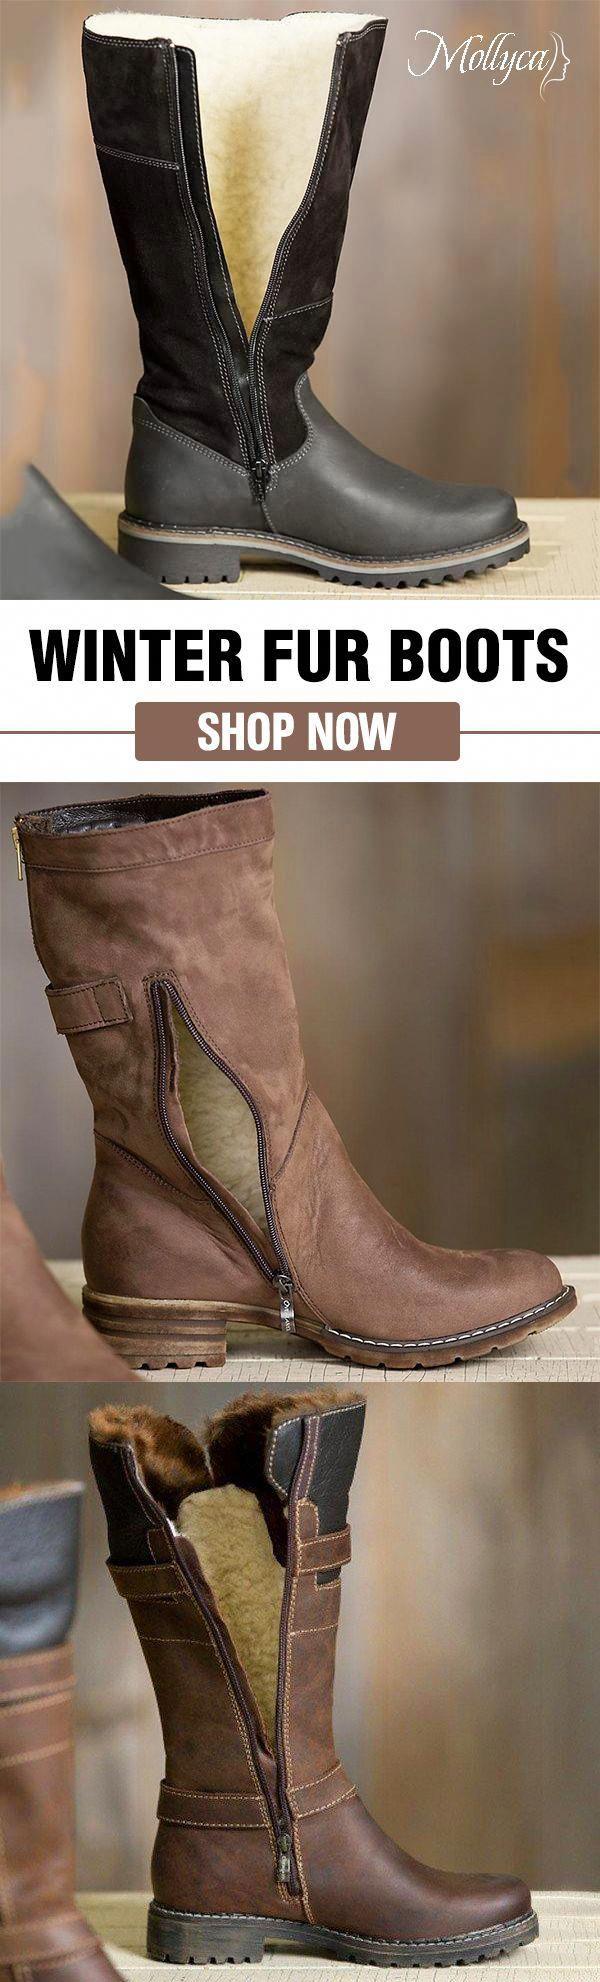 38++ Nike winter boots womens ideas info